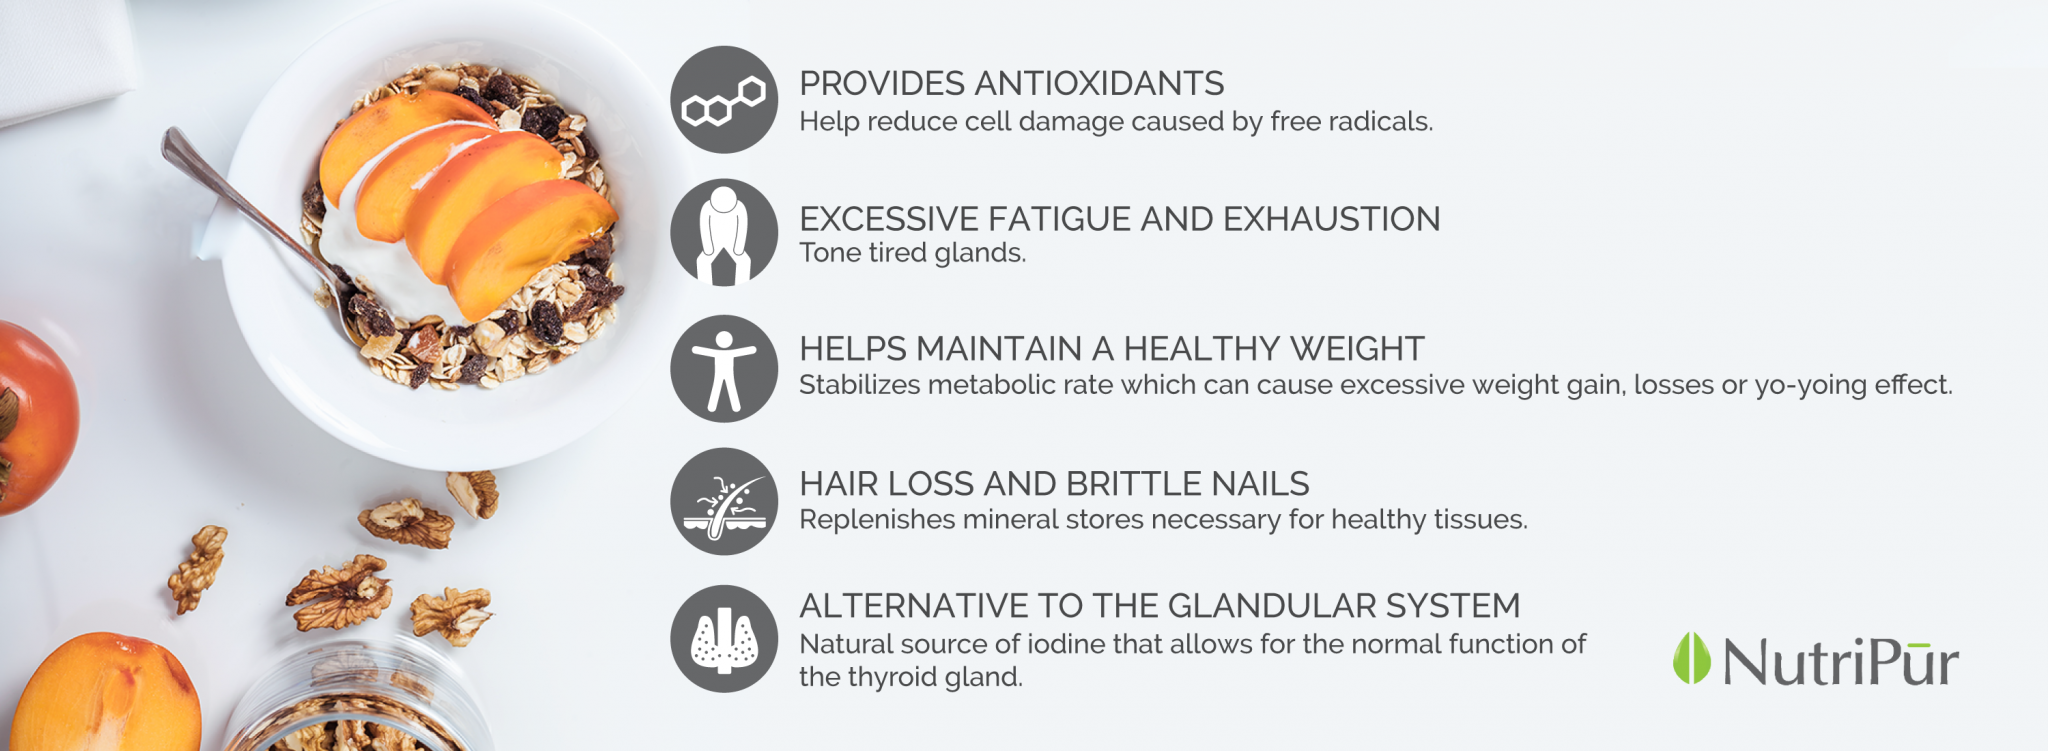 Kelp Plus - Nutripur - energy, immunity, antioxidant, hair loss, brittle nails